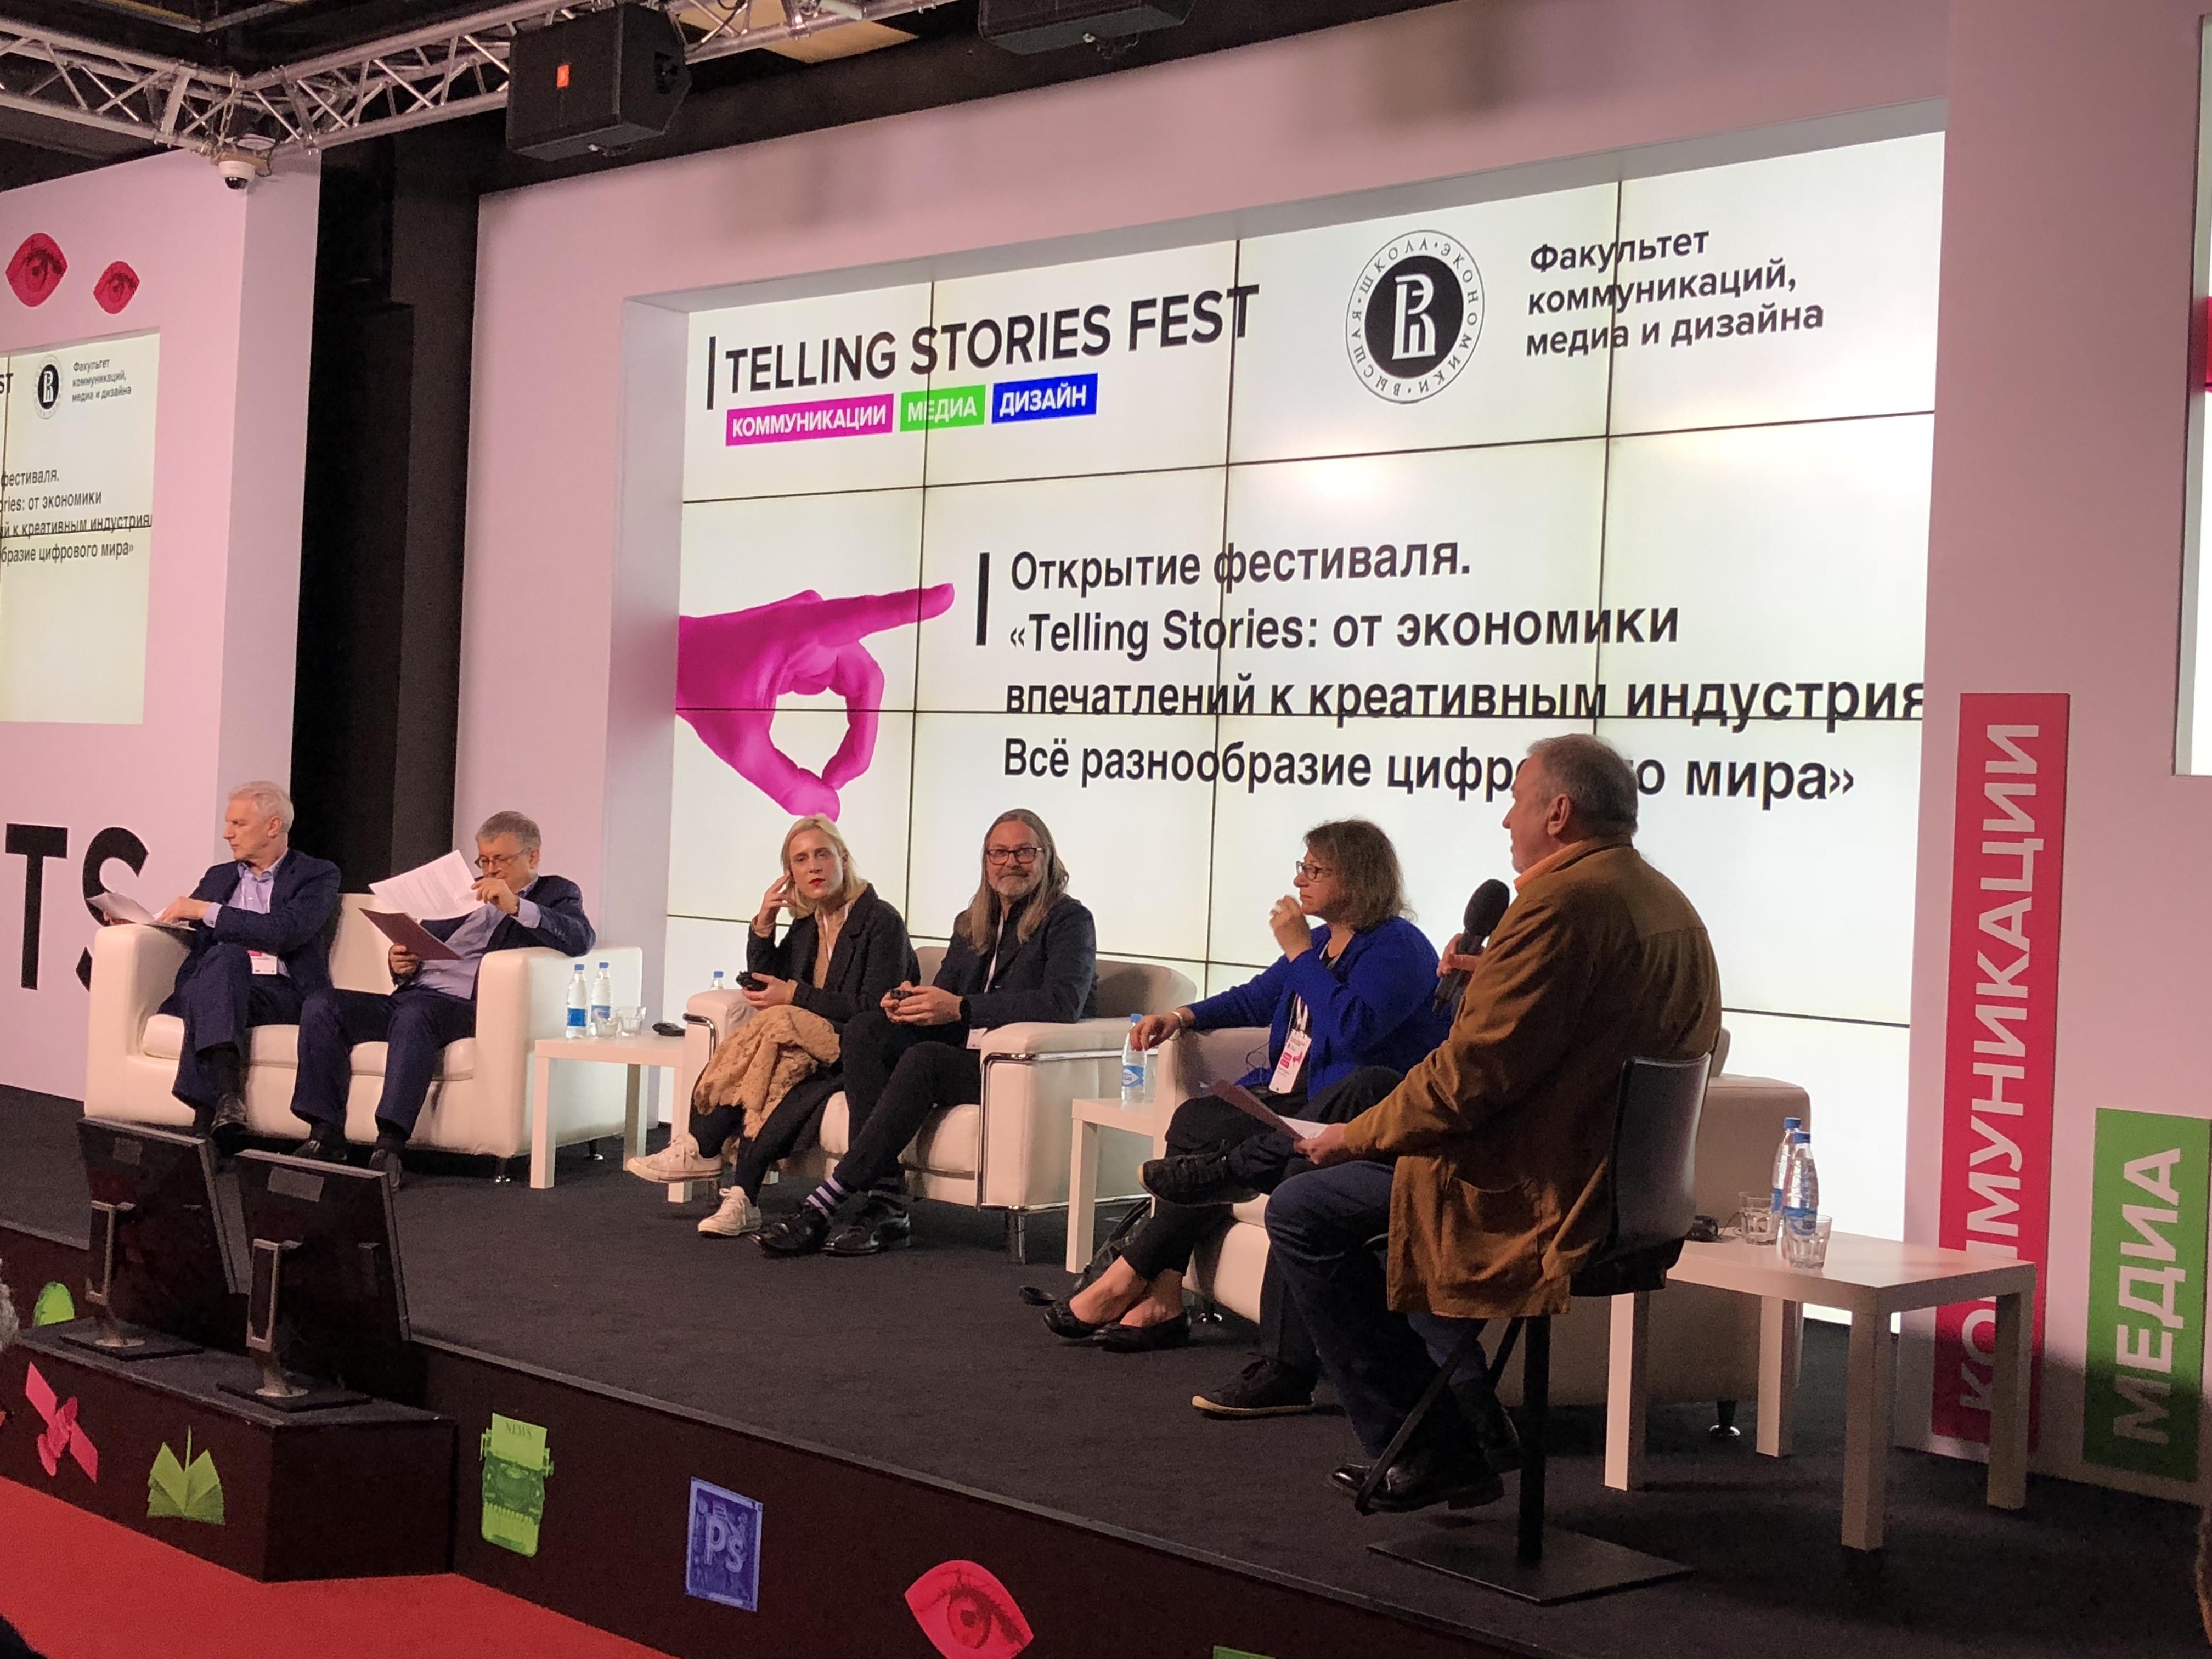 Фестиваль Telling Stories Fest